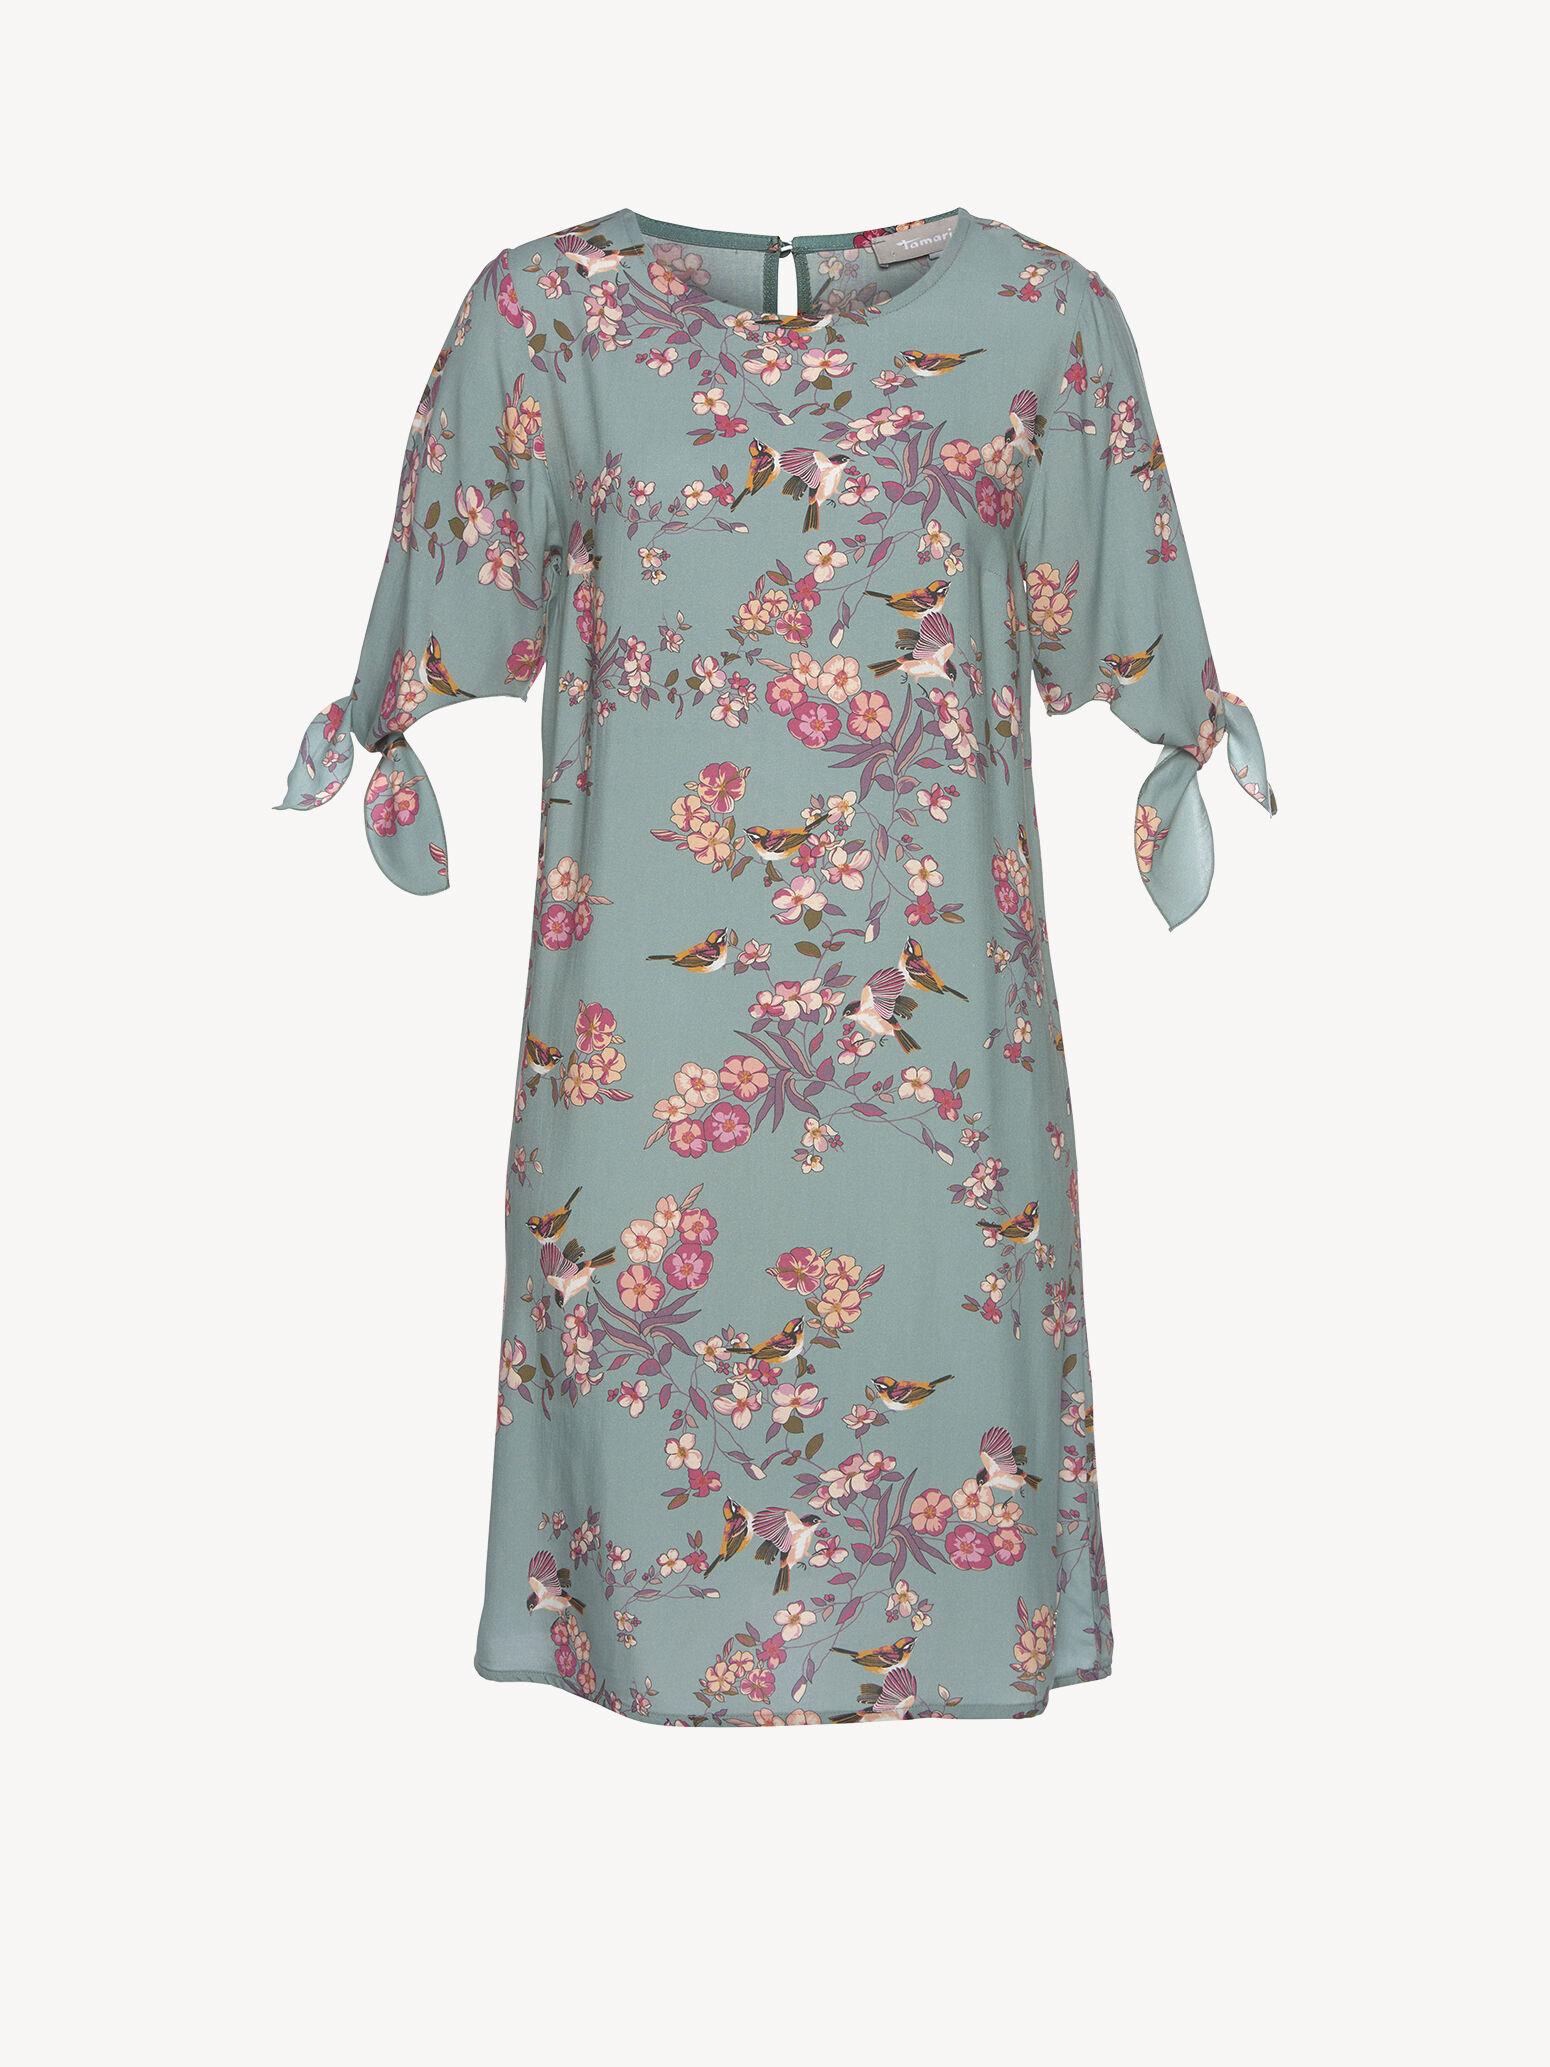 Clothing | Buy Clothing online | Reebonz Belgium